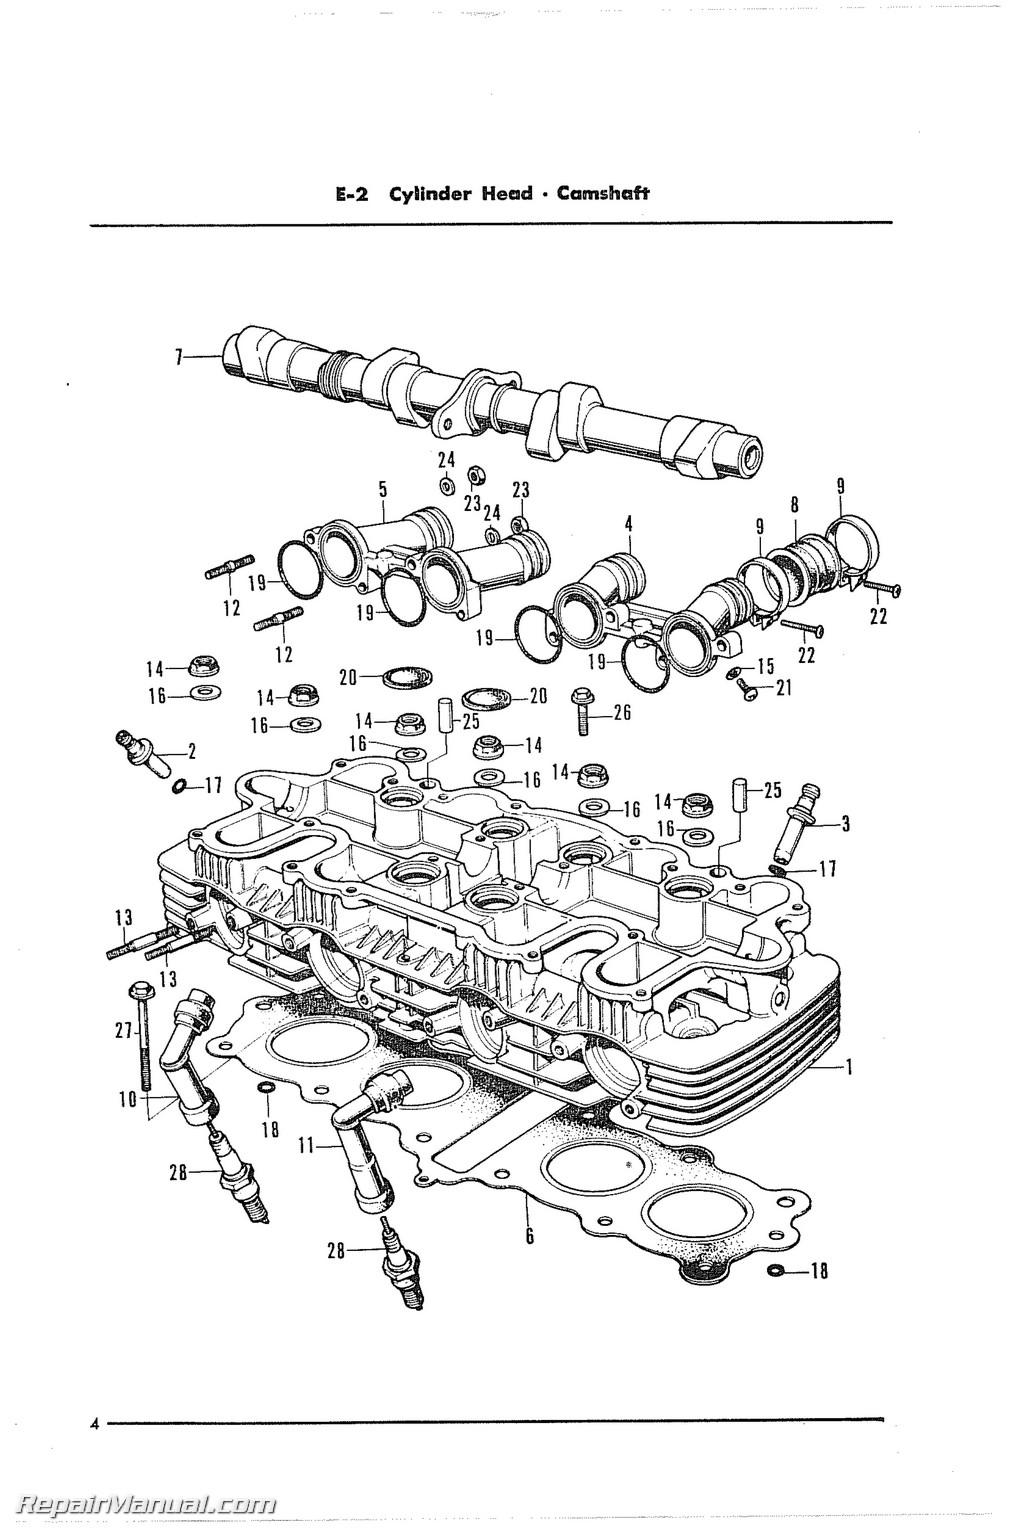 Honda Cb500 Four Cylinder Motorcycle Parts Manual